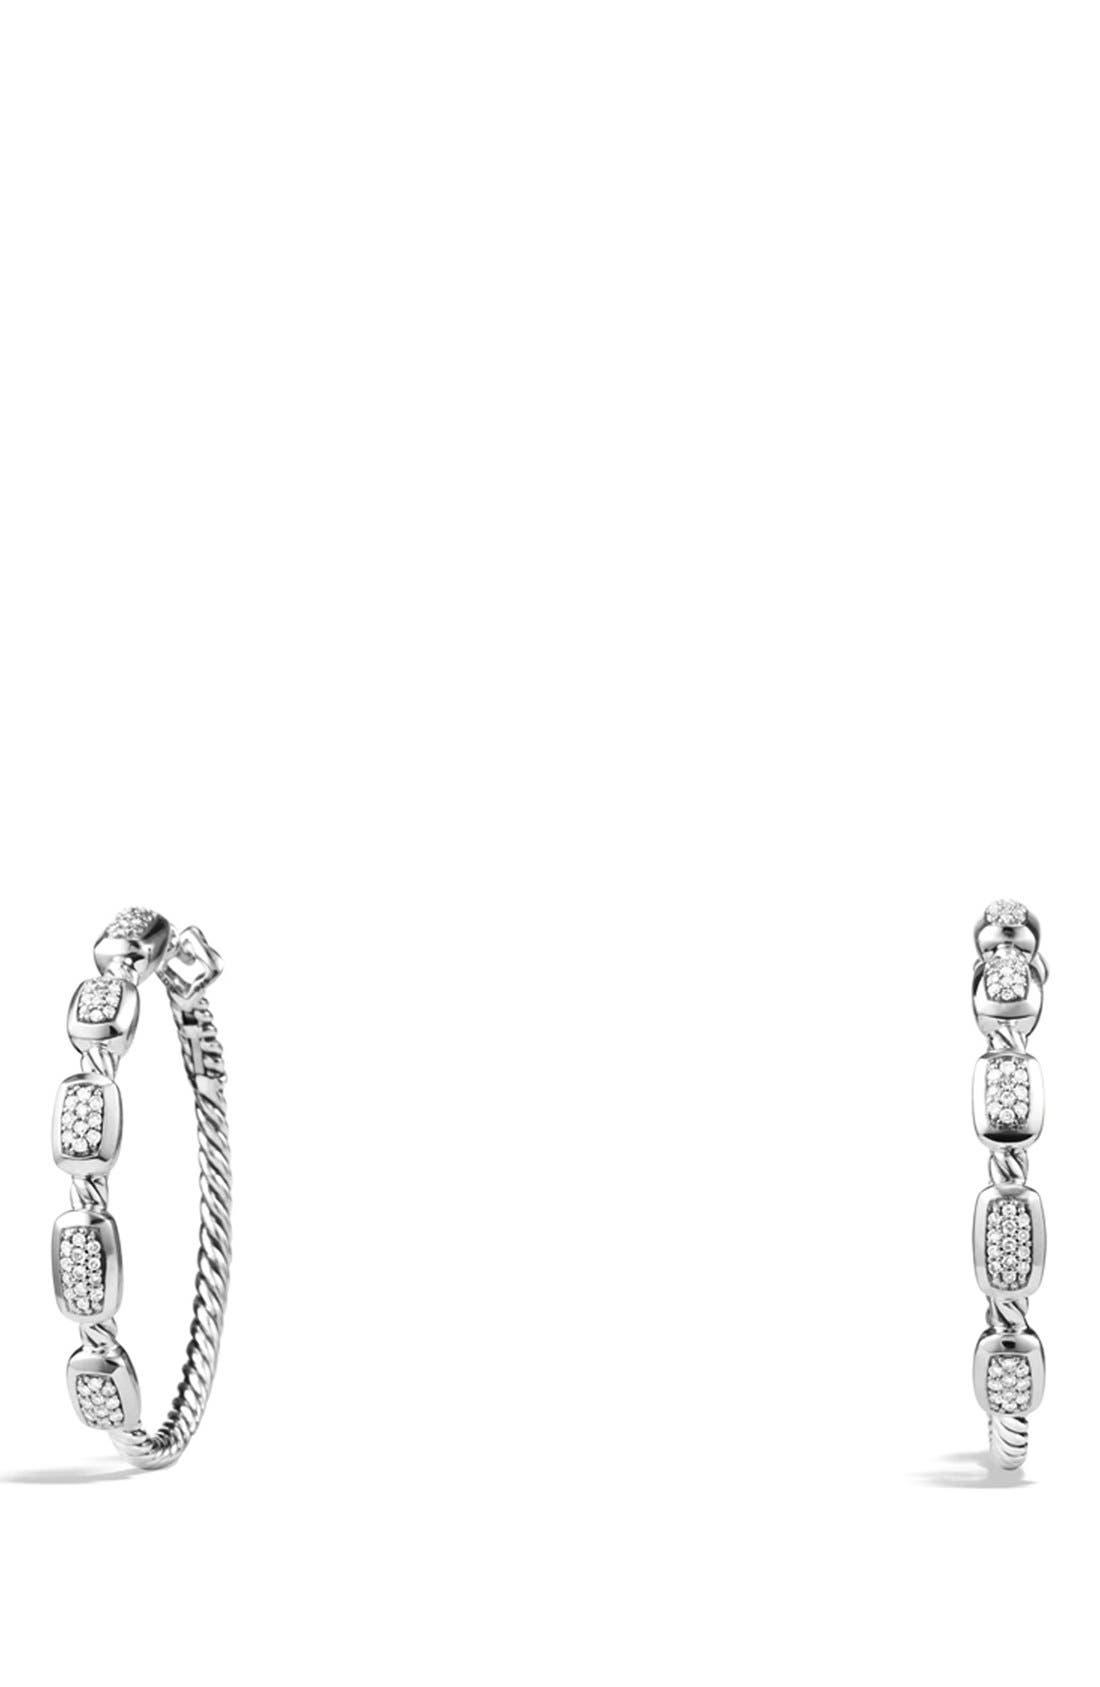 'Confetti' Hoop Earrings with Diamonds,                             Main thumbnail 1, color,                             Diamond